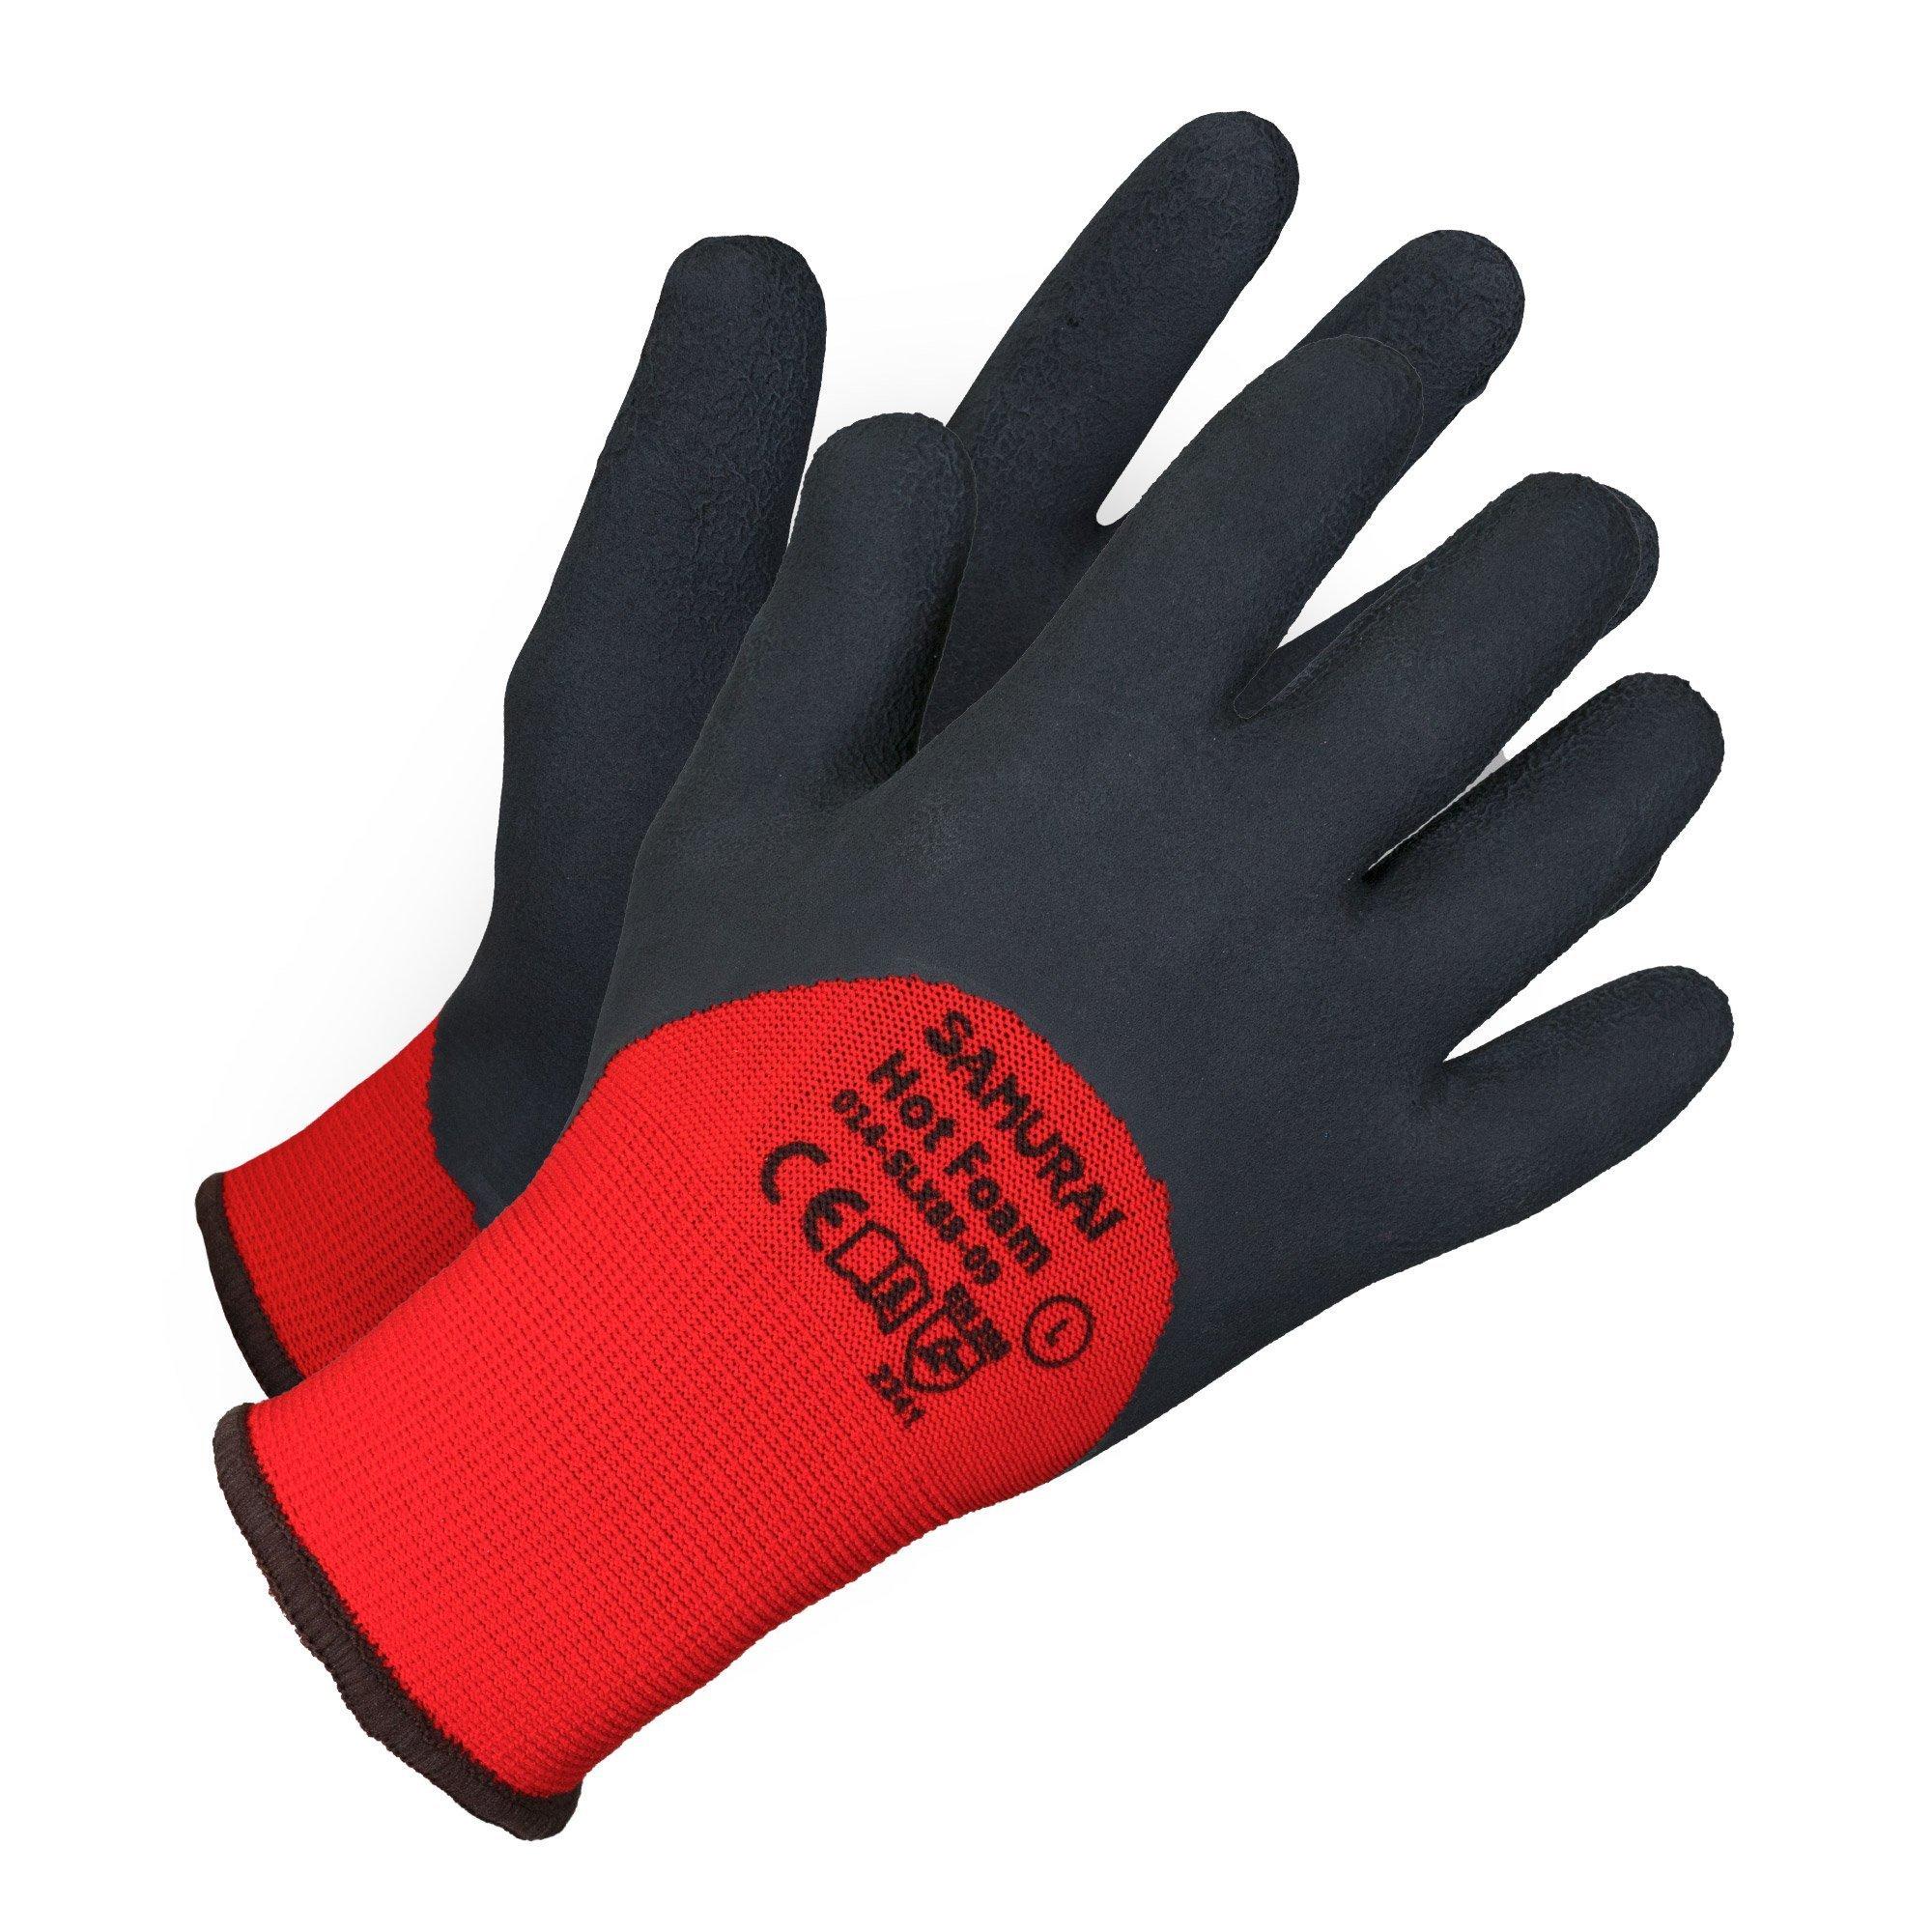 Gloves - Samurai Ice (Large, Size 9)